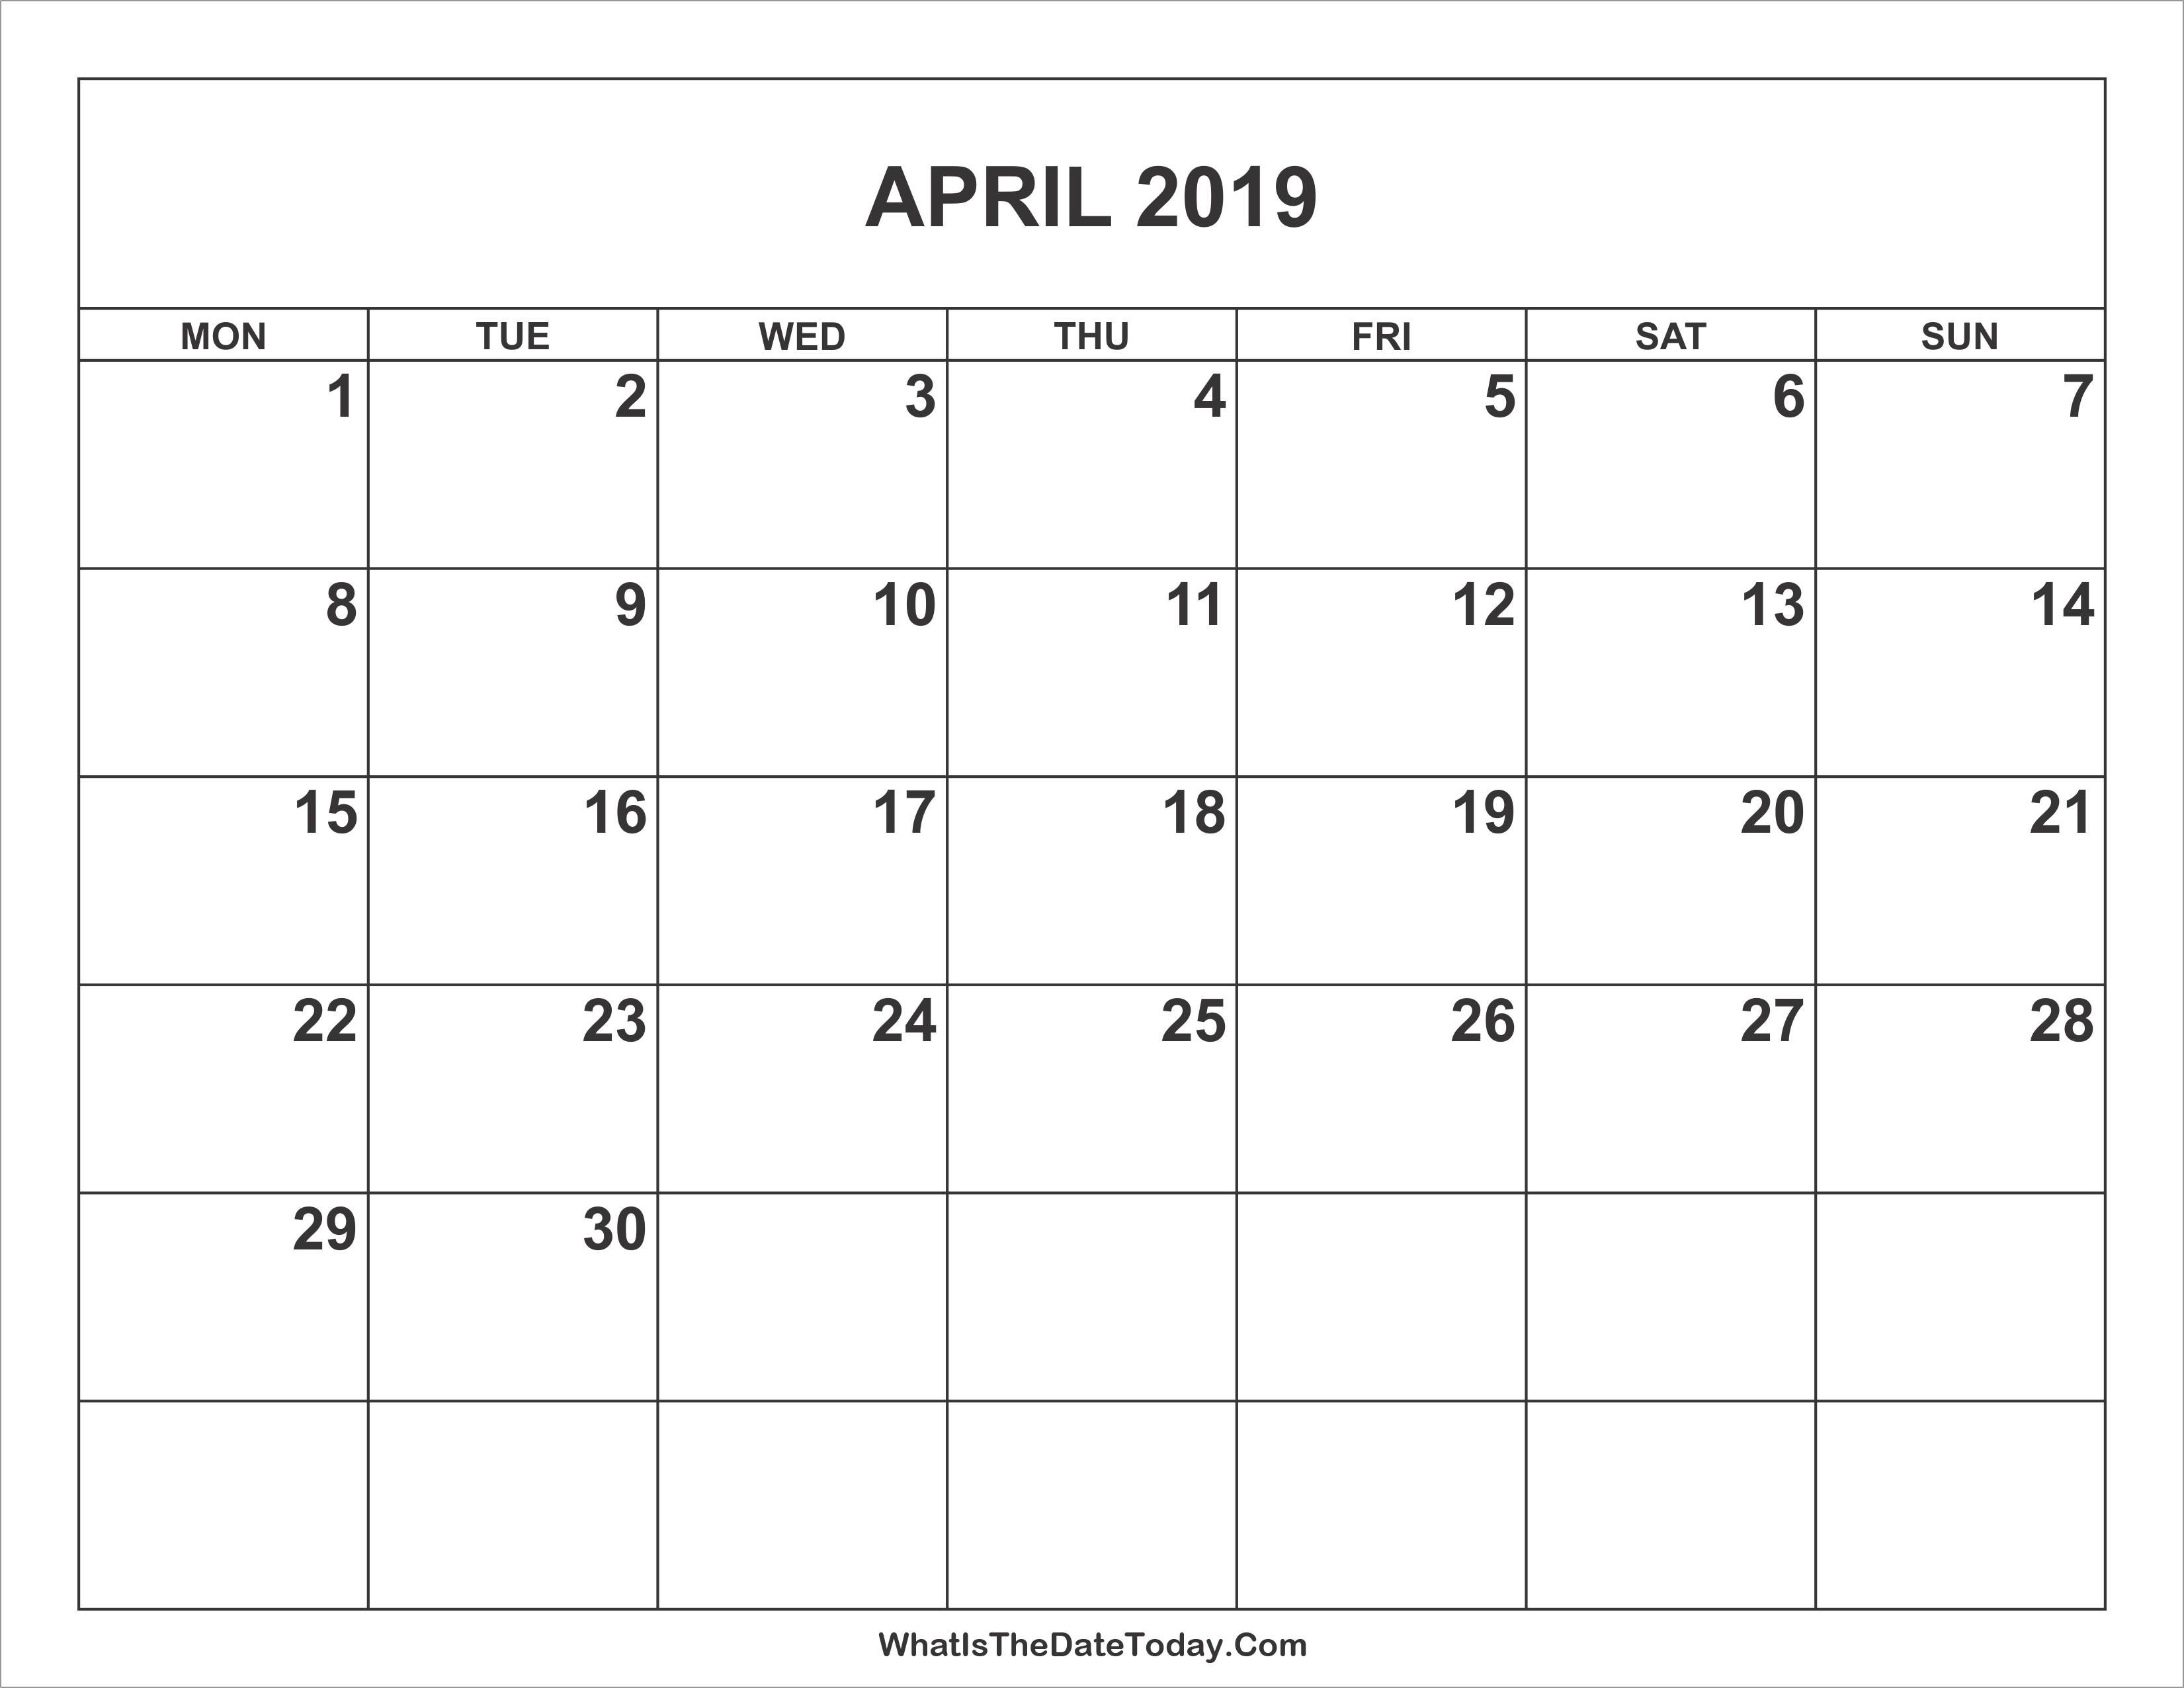 Empty March Calendar Más Actual April 2019 Calendar Word April 2019 Calendar Of Empty March Calendar Más Actual the Ideal Instance E S Blank Calendar Templates July 2018